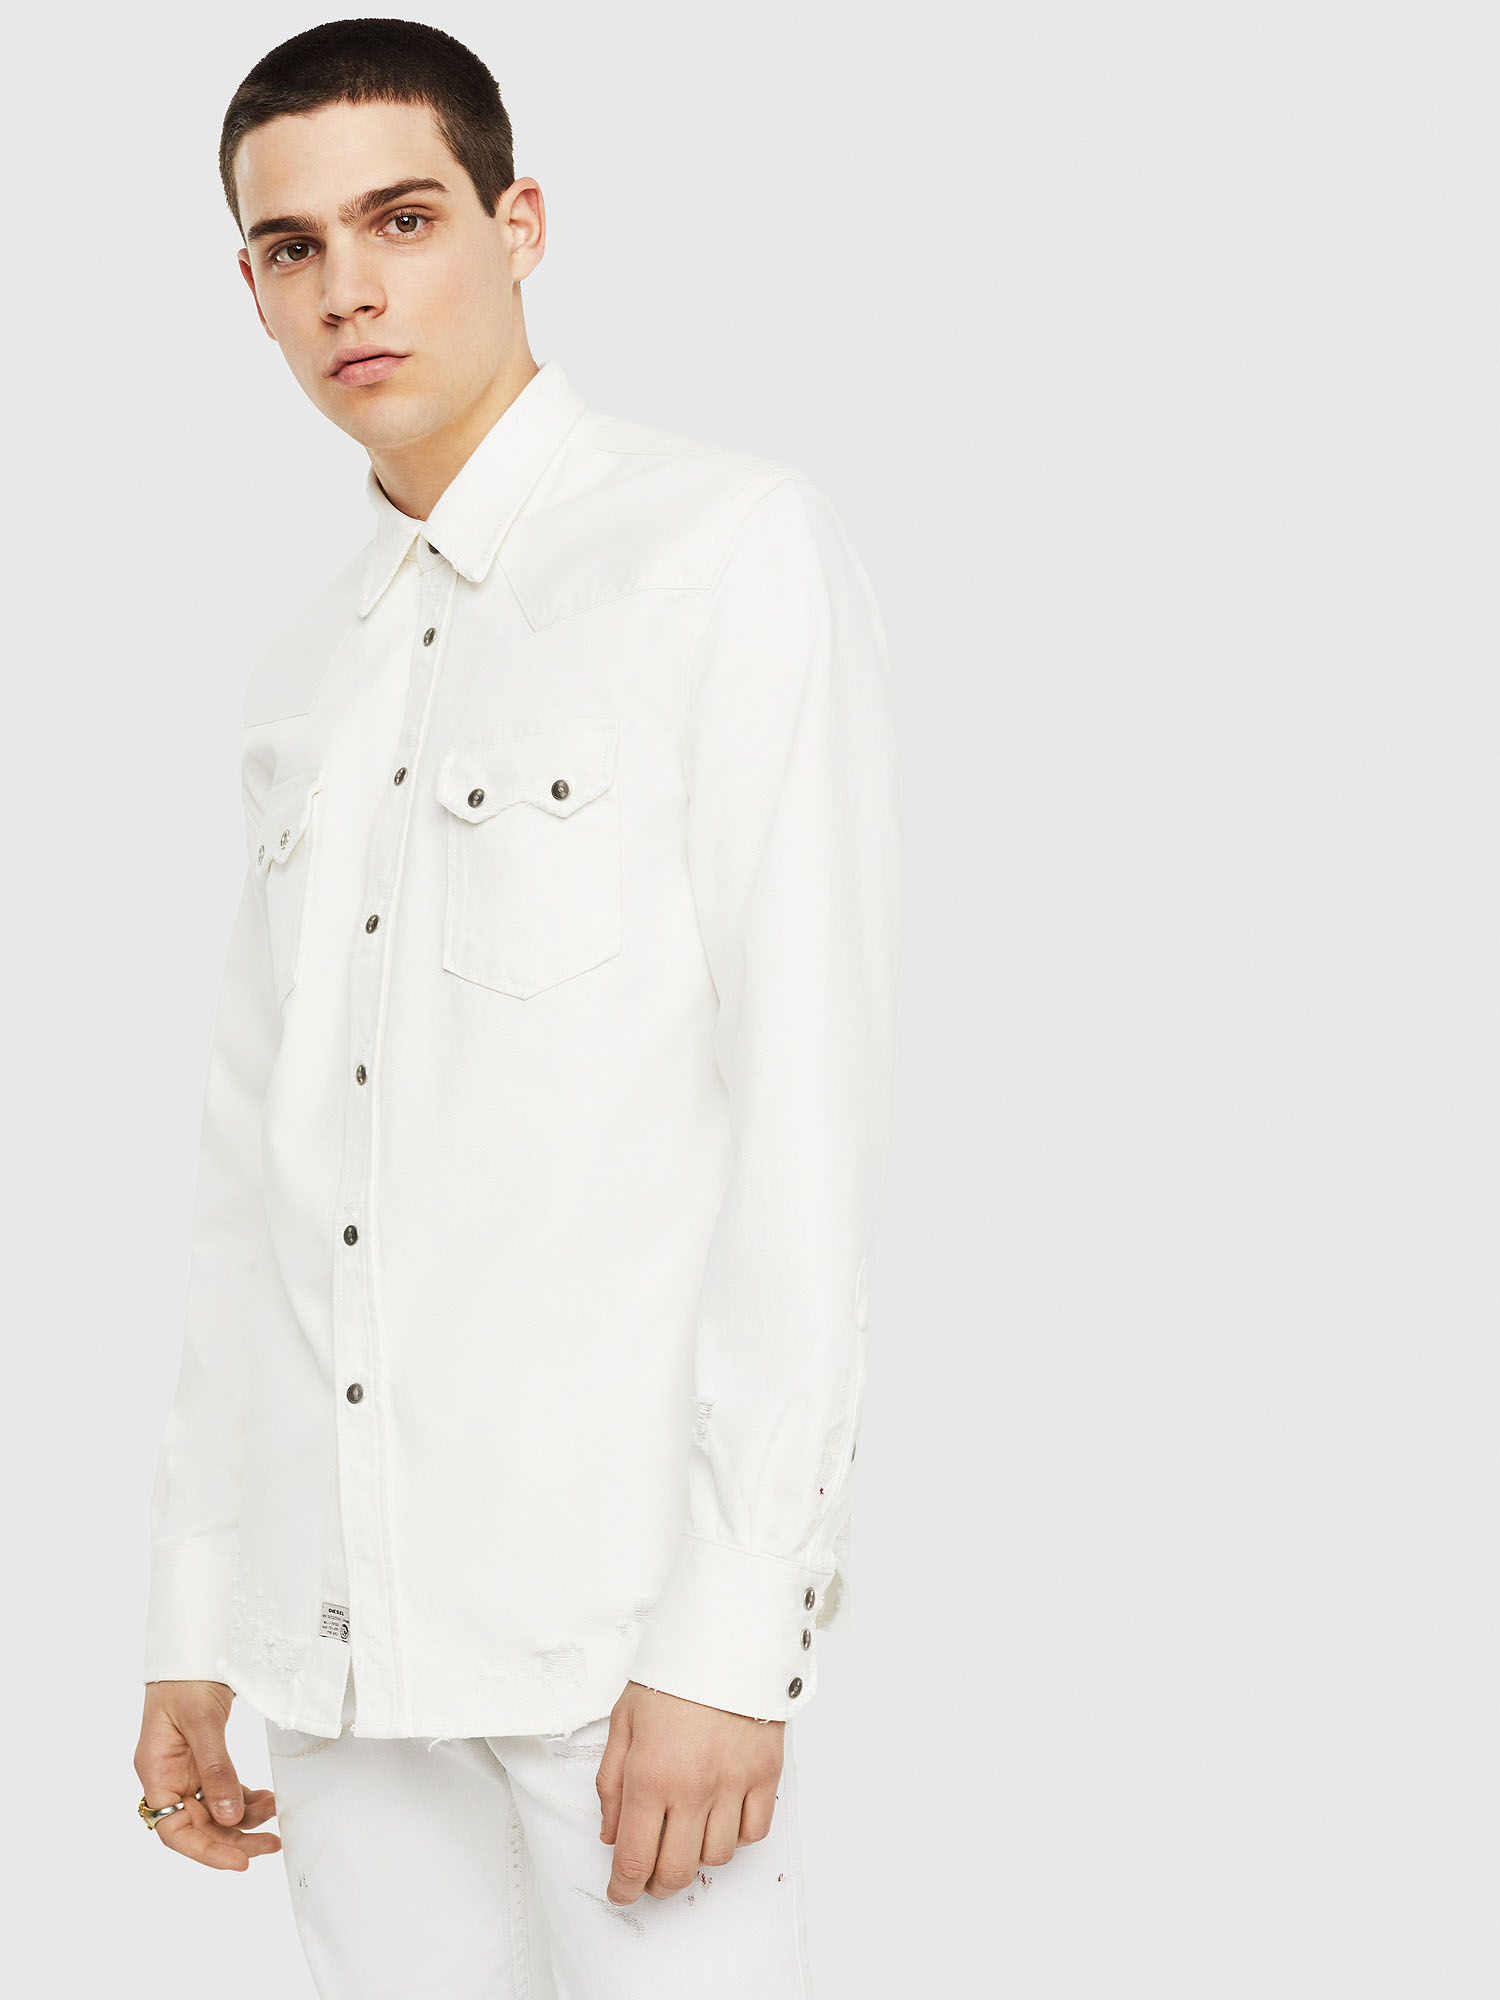 Diesel Denim Shirts 0GASO - White - L